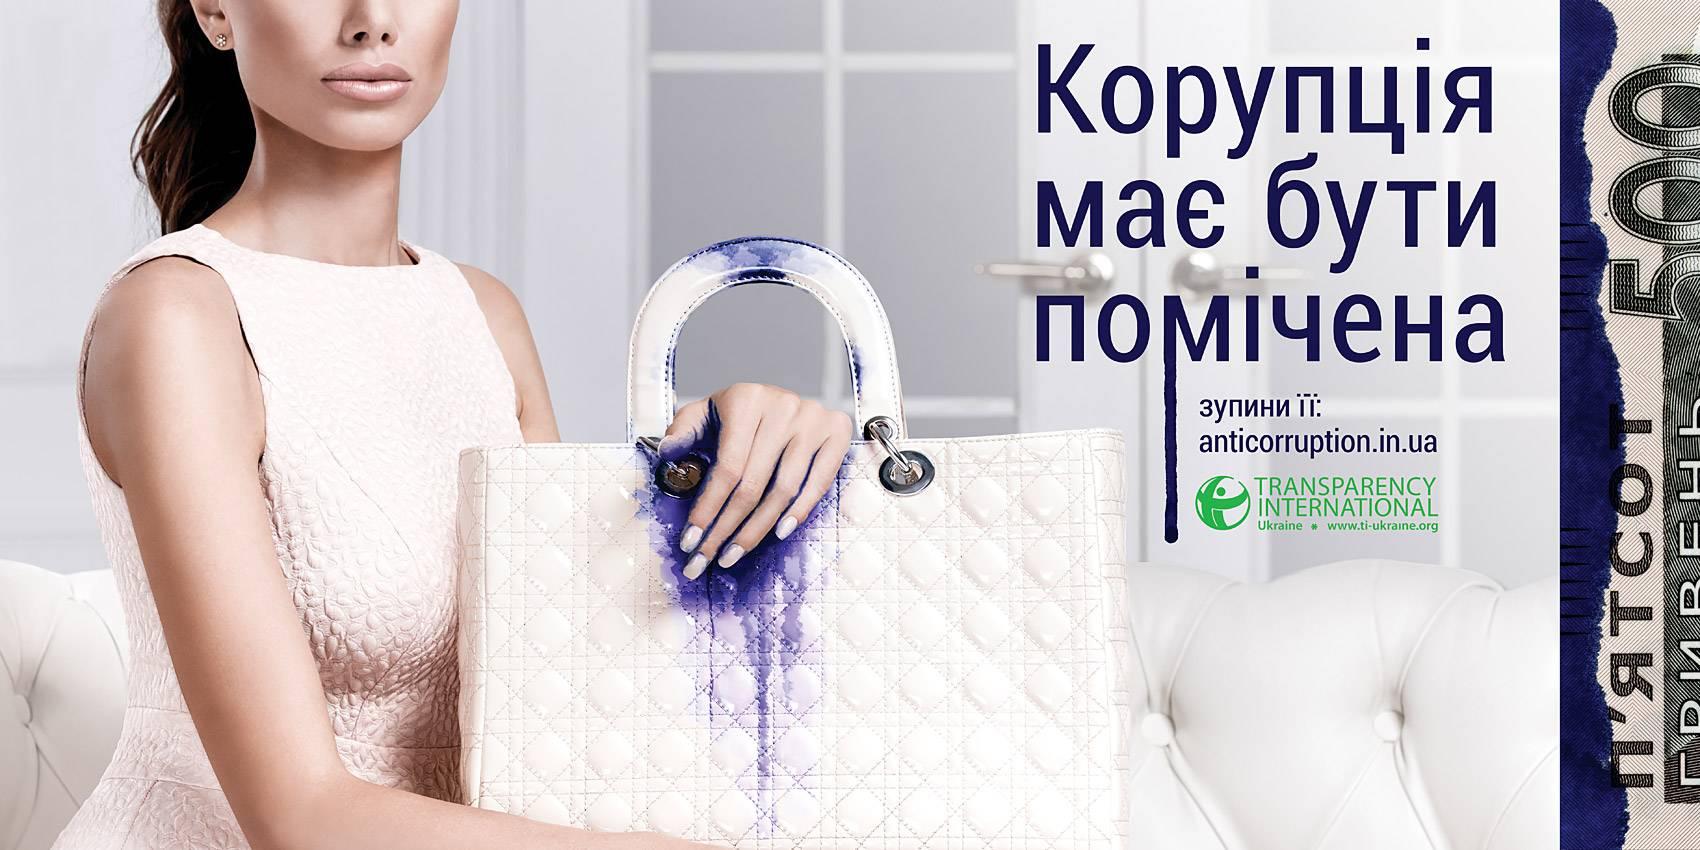 Anti-corruption advertising